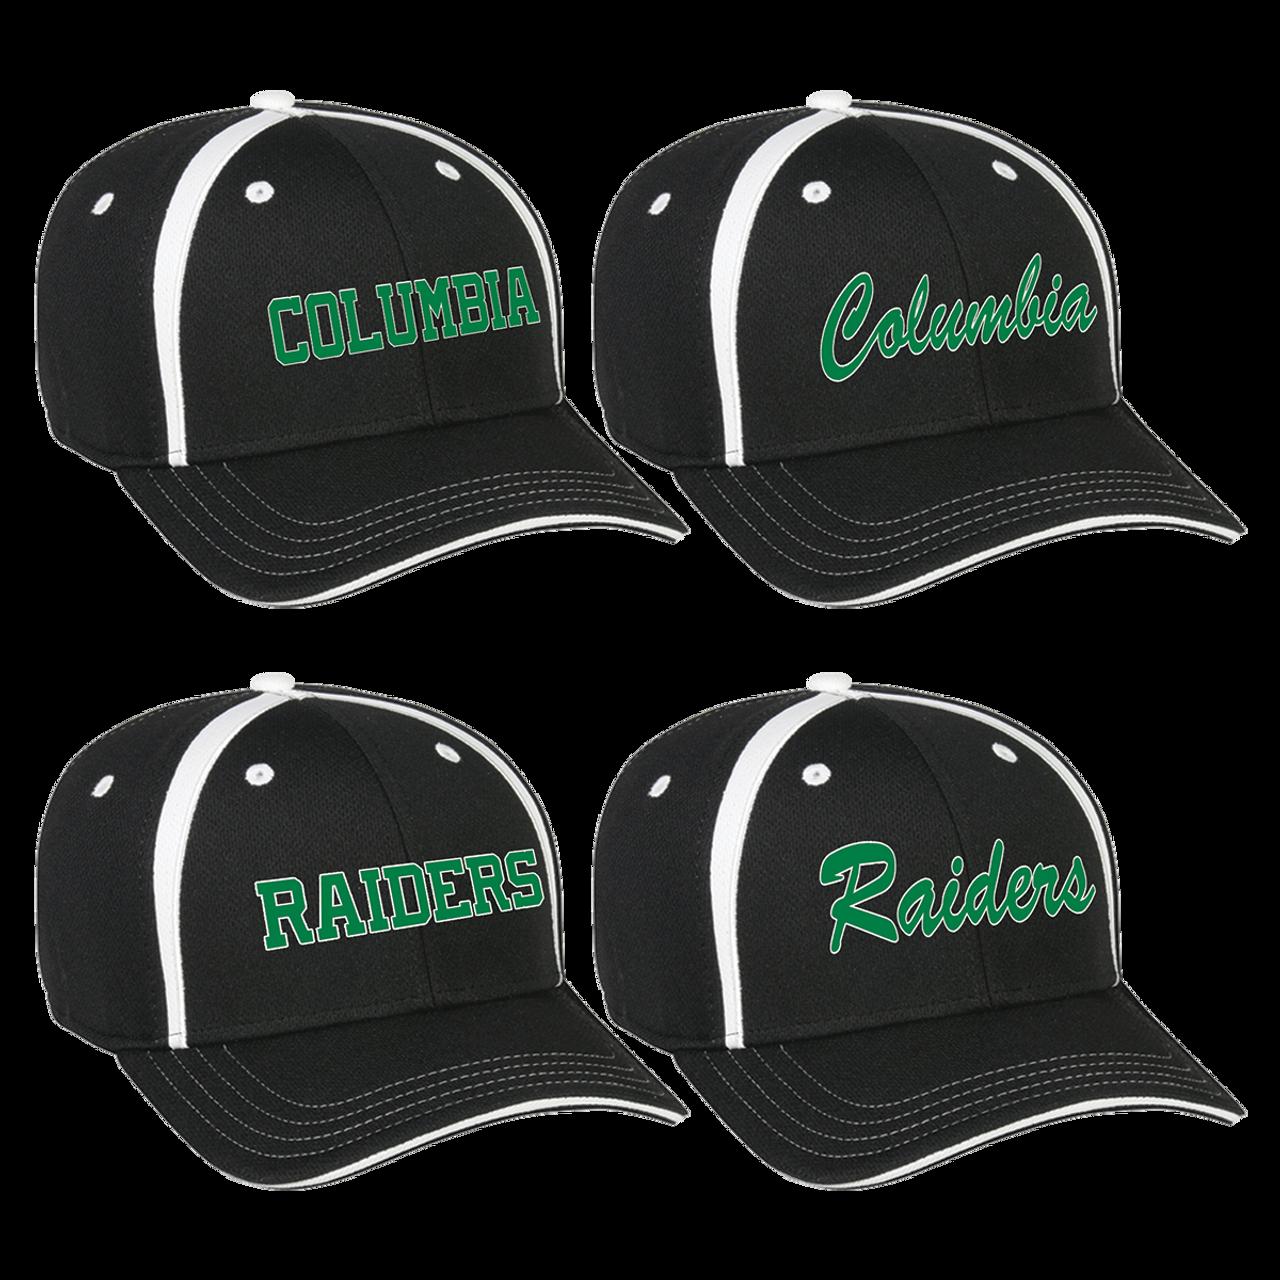 a6f7609dfea59 Columbia Raiders Cap (RY201 RY203 RY205 RY207) - RycoSports